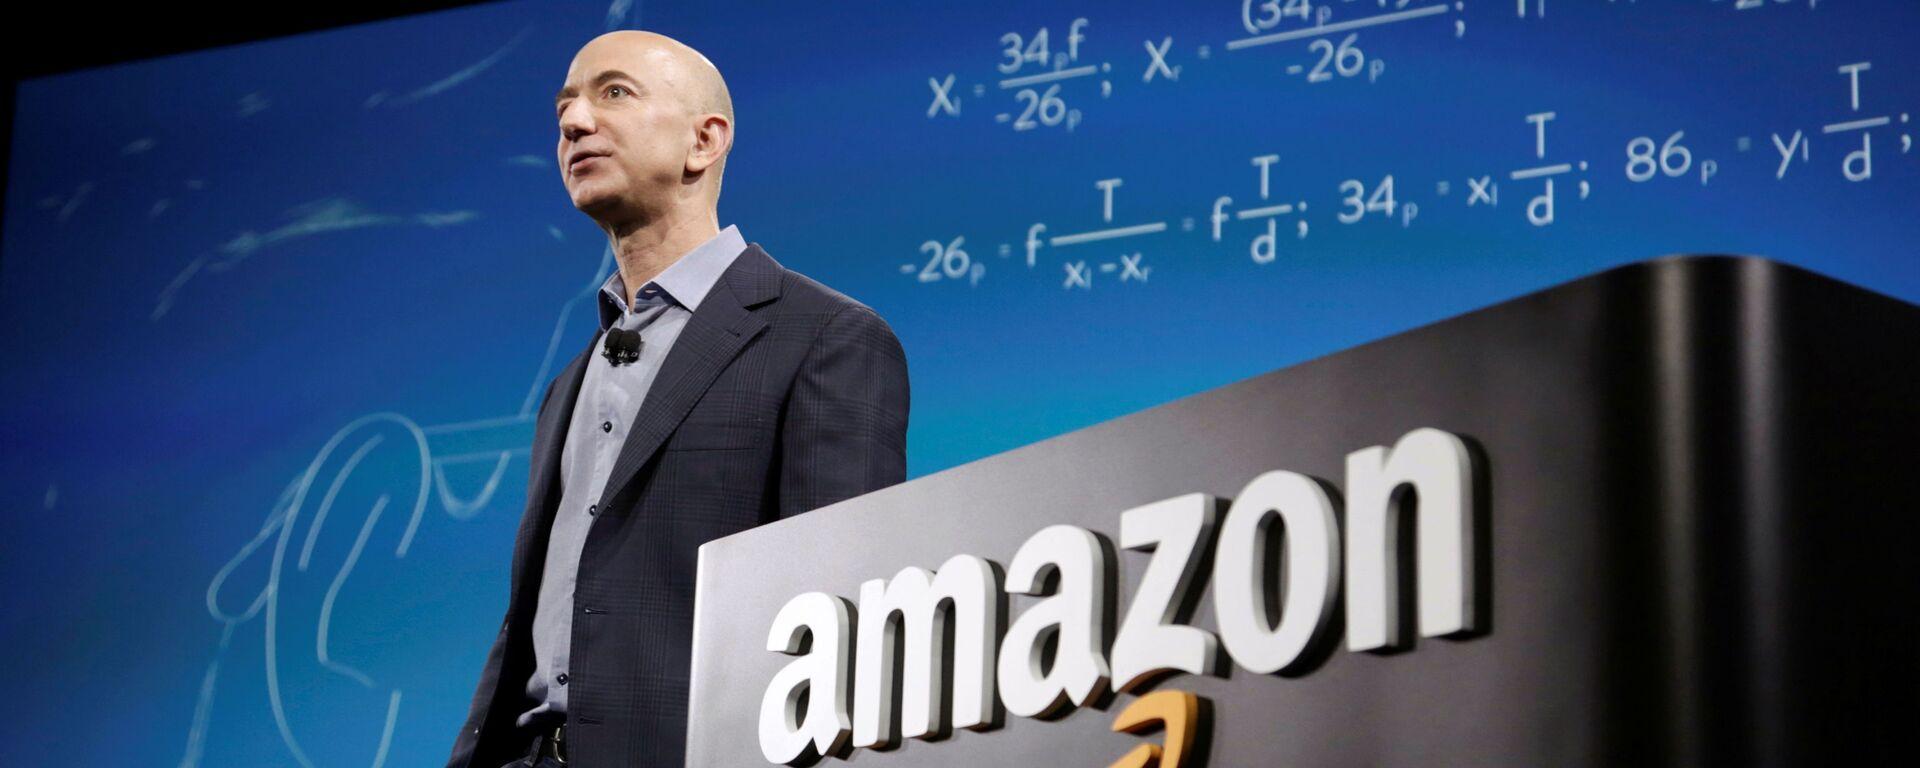 Jeff Bezos, director ejecutivo de Amazon - Sputnik Mundo, 1920, 25.07.2021